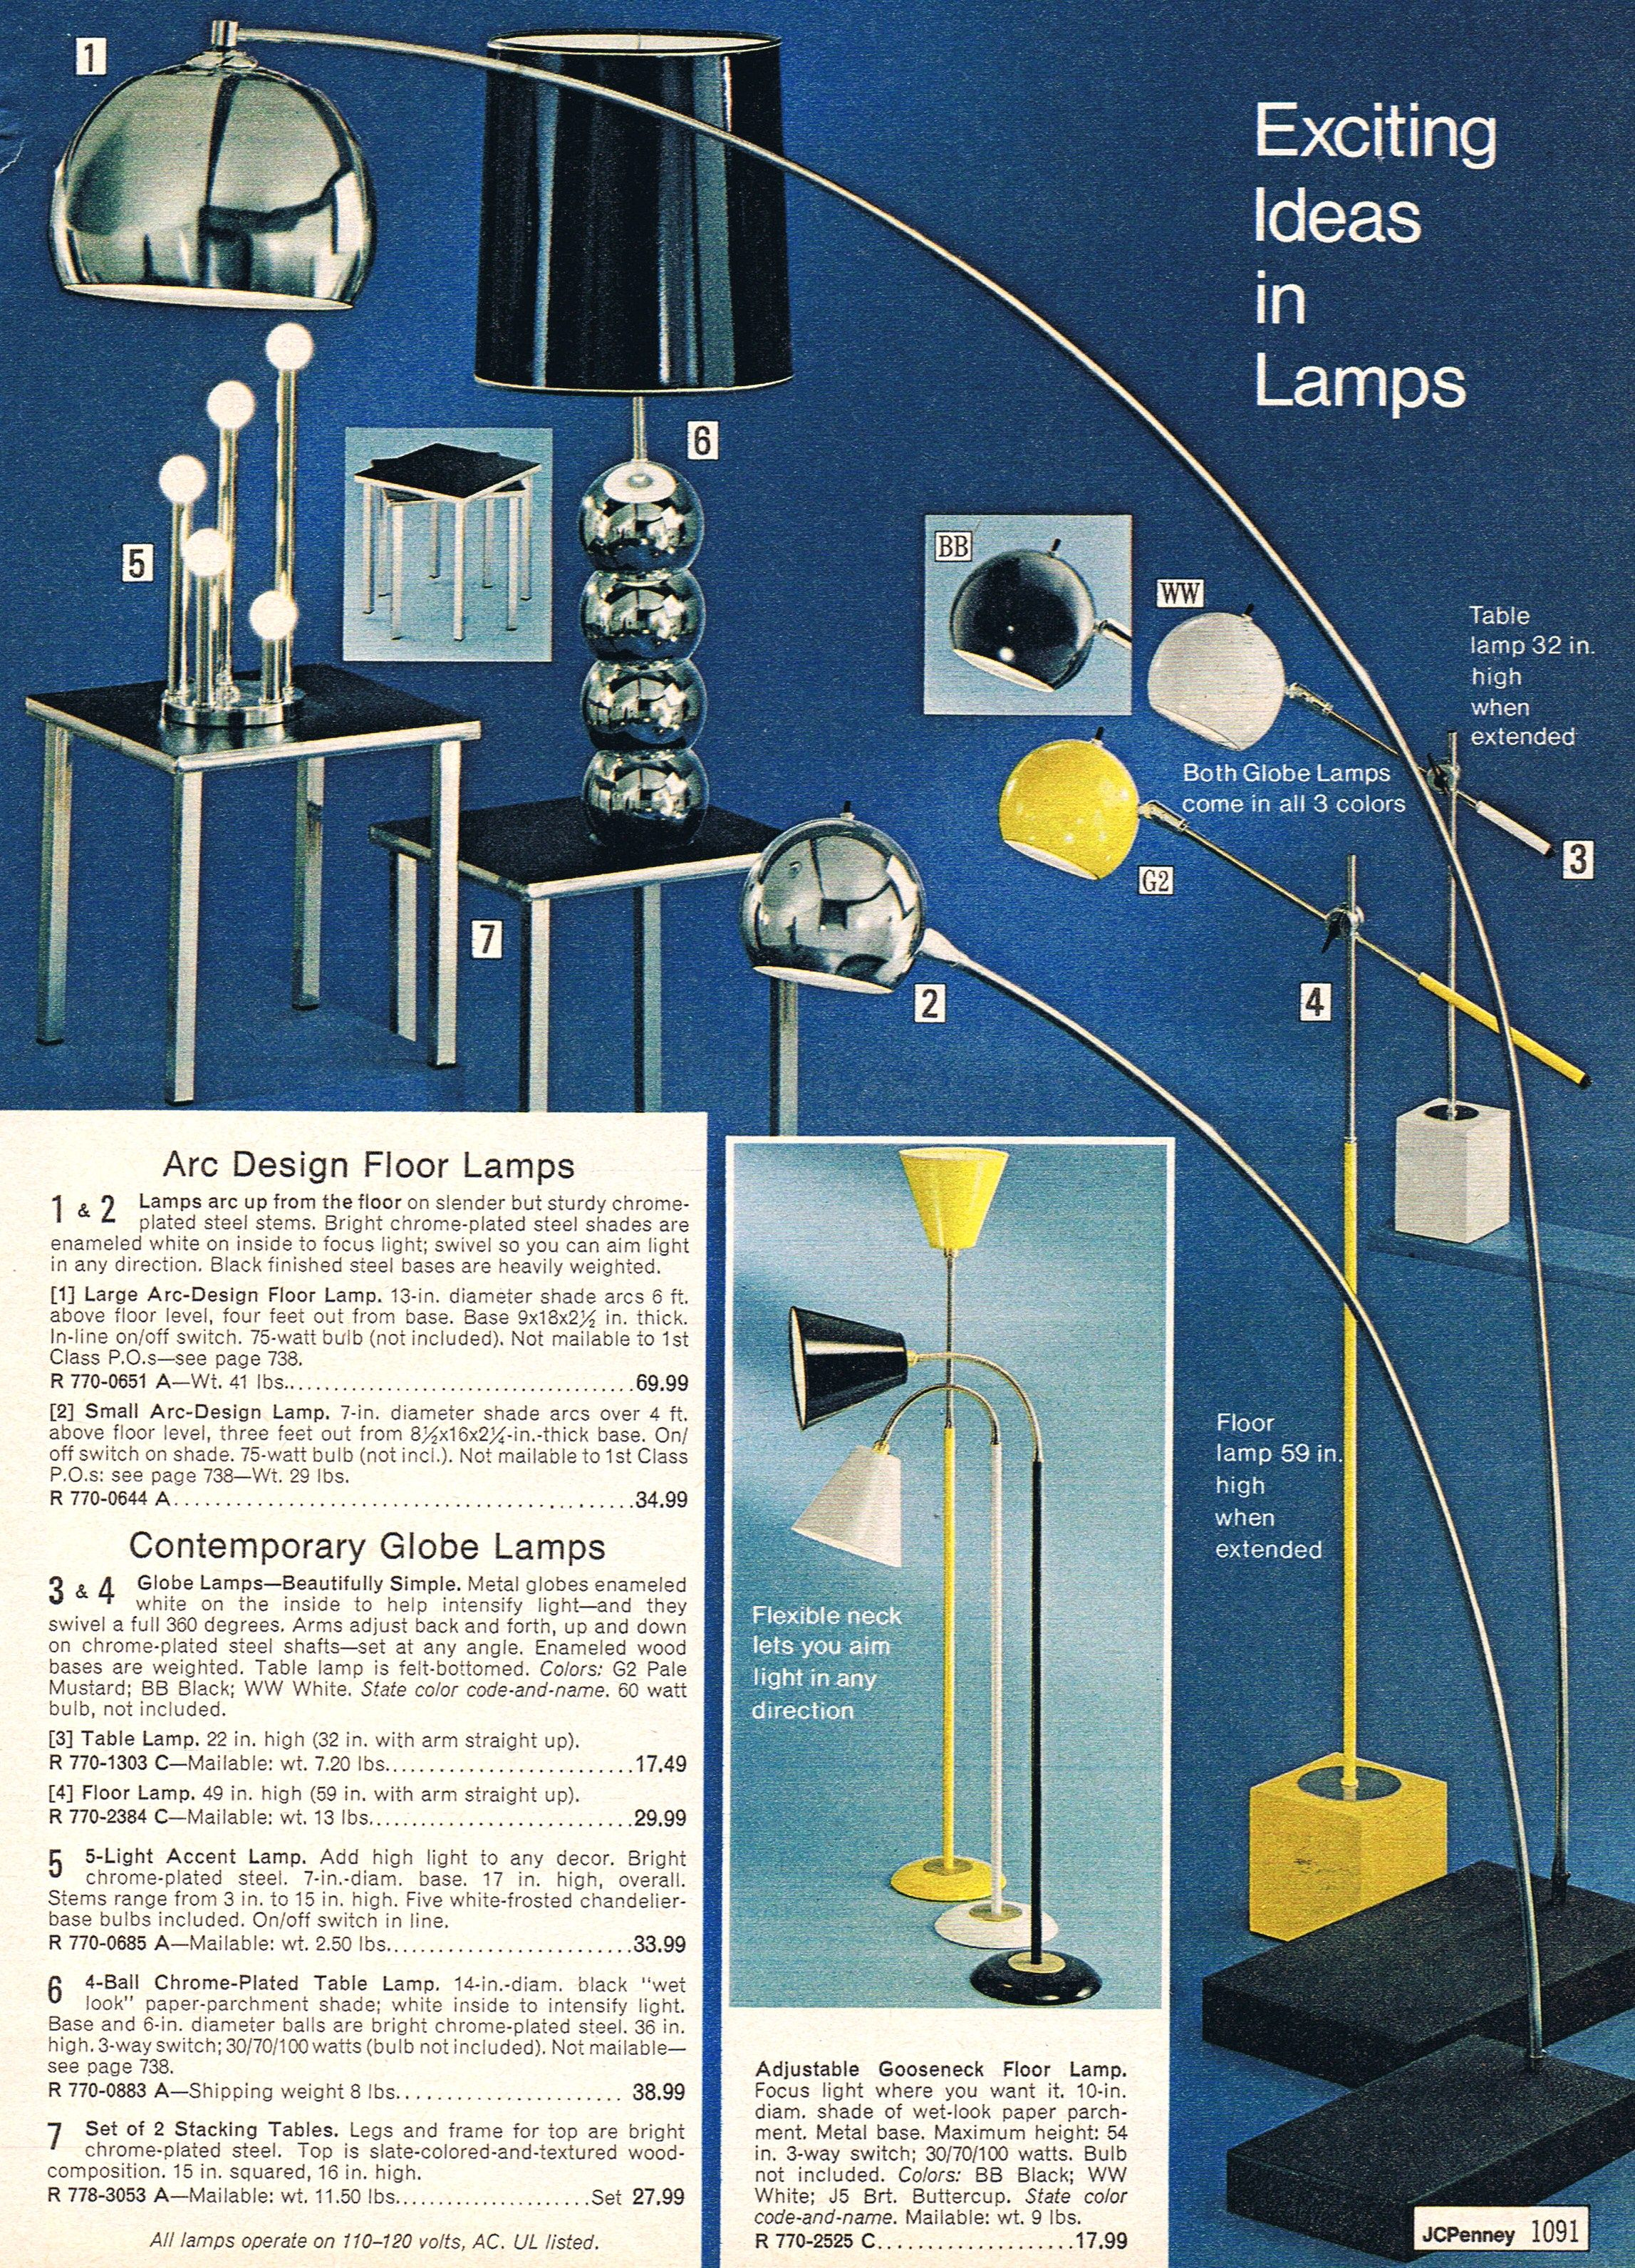 Fabulous 70s Lighting Mid Century Modern Pinterest 3 Way Switch Color Code